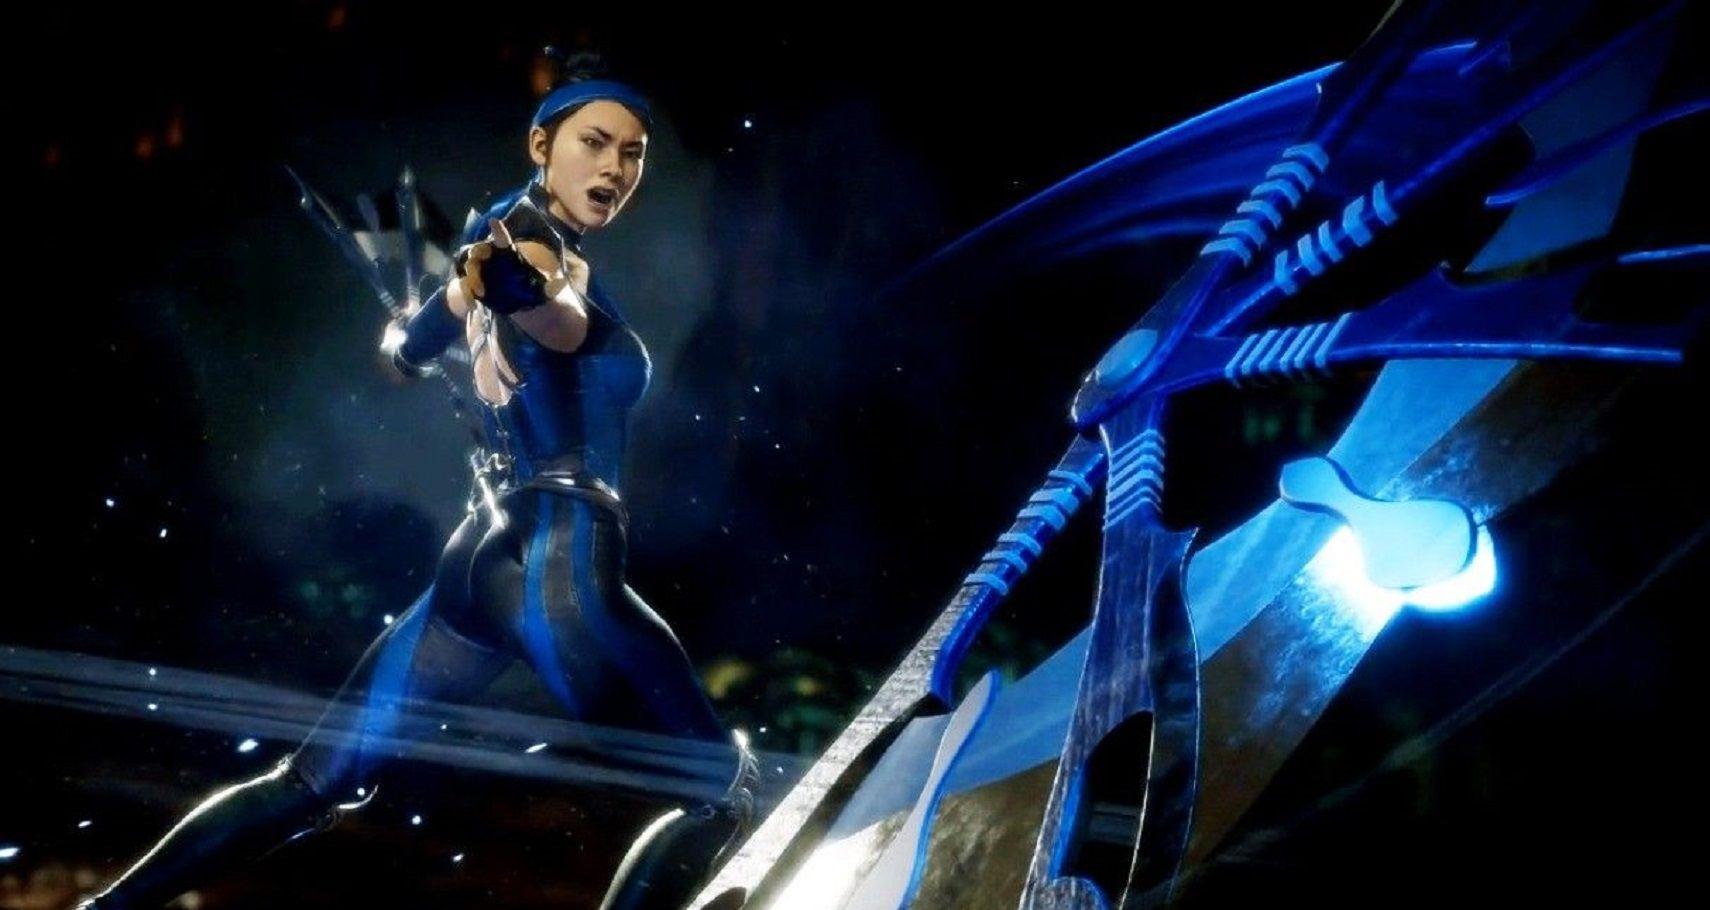 Forget Chun-Li, Why The Hell Isn't Kitana In The Mortal Kombat Movie?